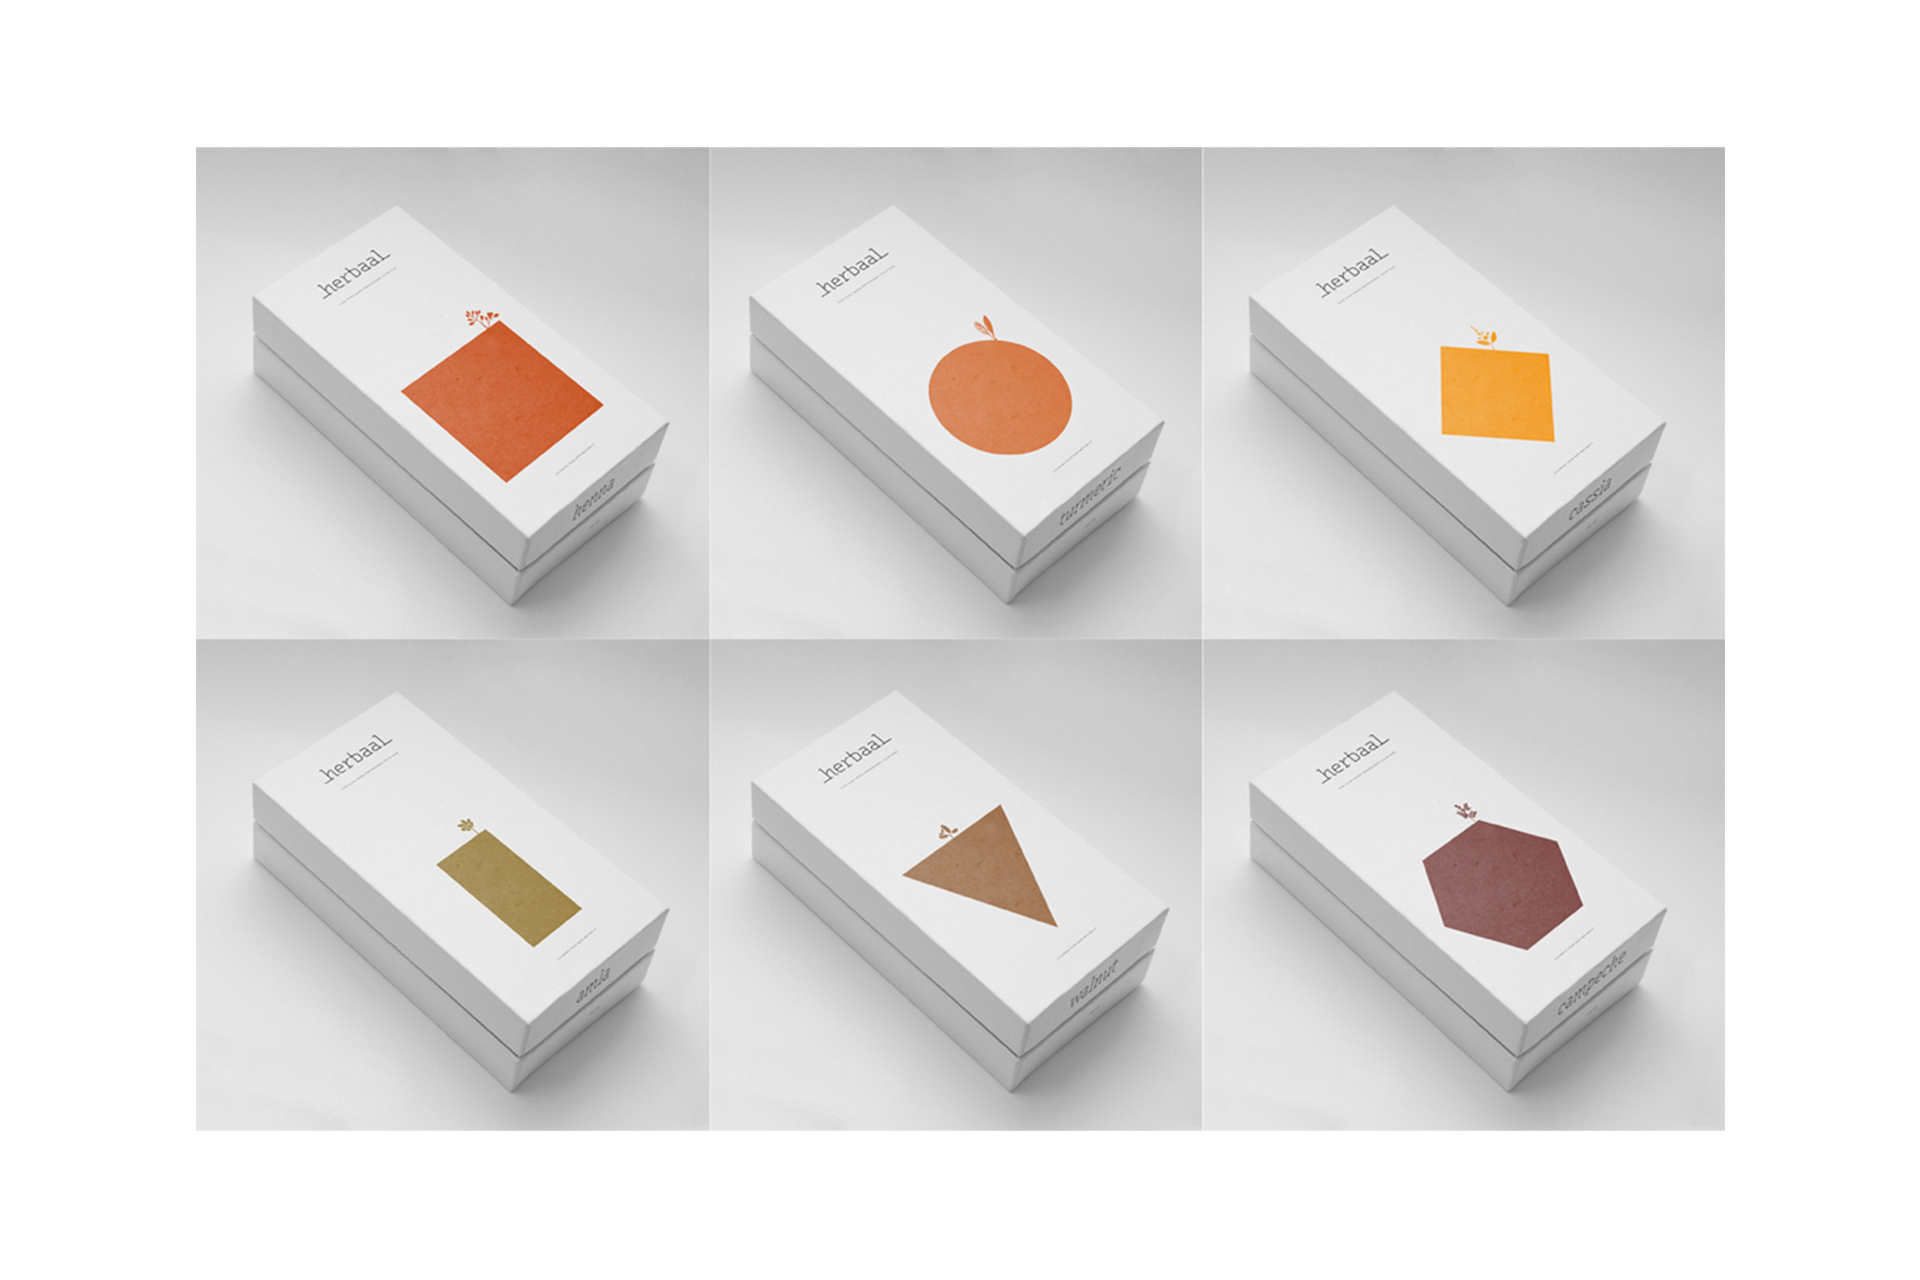 Herbaal Branding, Storytelling, Packaging & Product Design by Silenceworks - Creative Work - $i